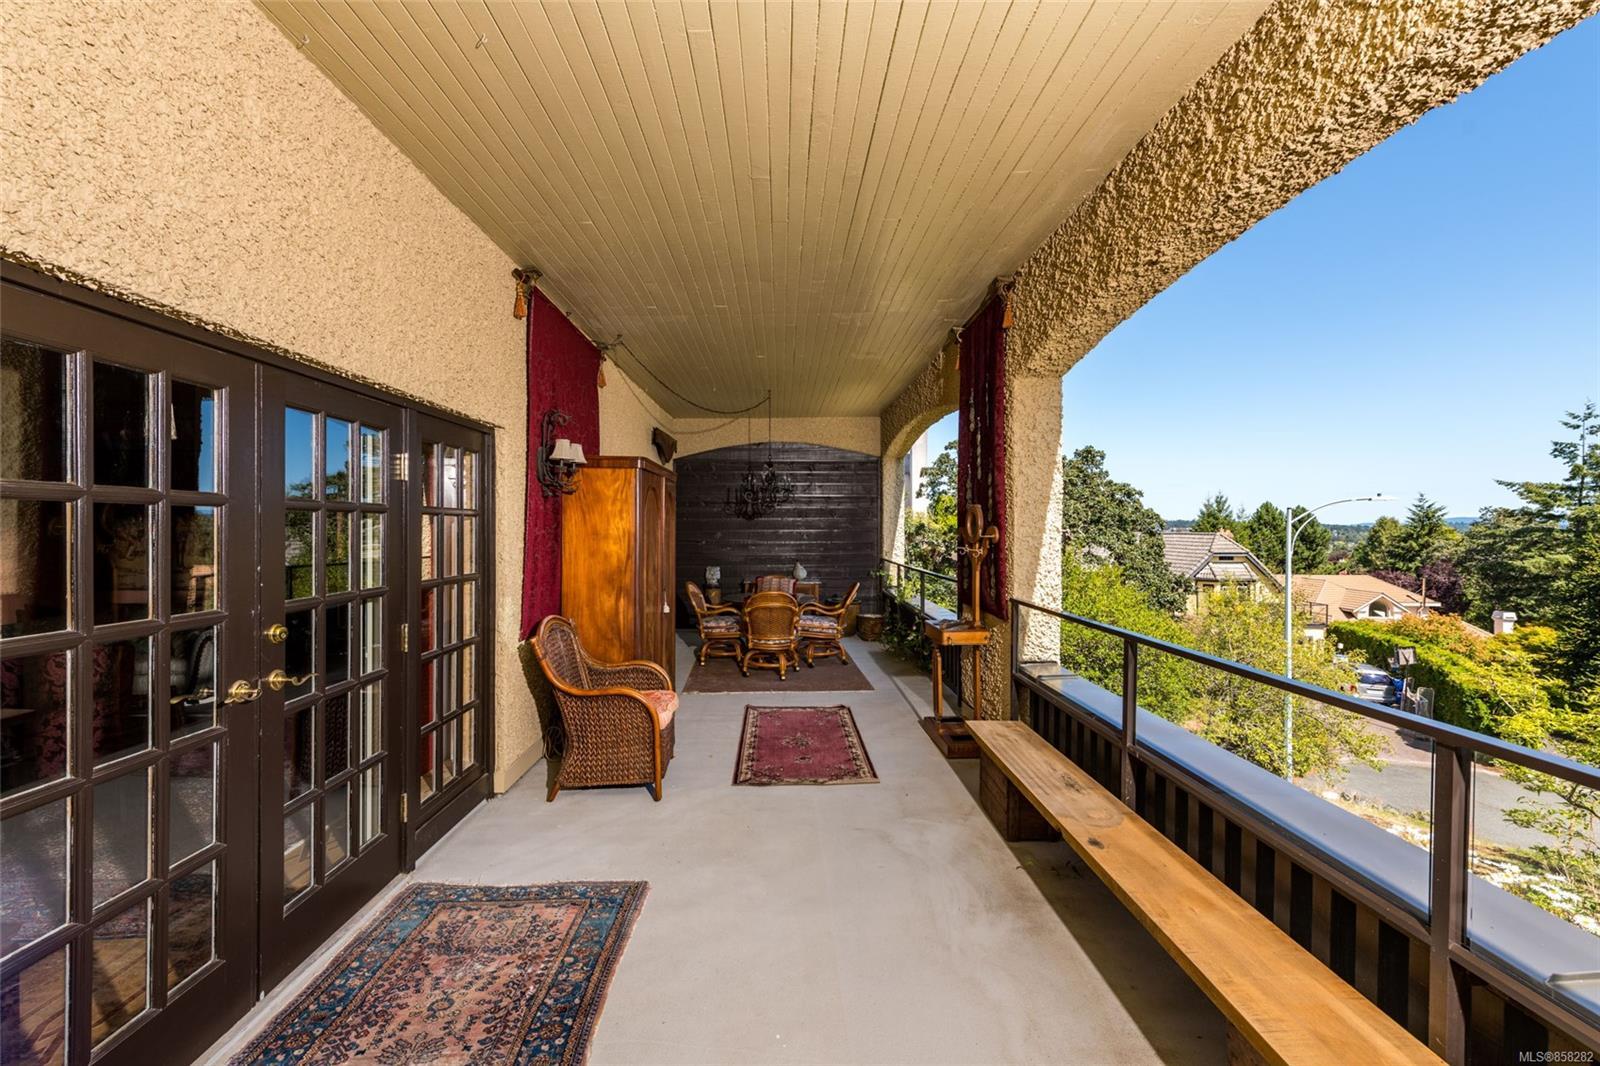 Photo 22 at 2 - 1001 Terrace Avenue, Rockland, Victoria